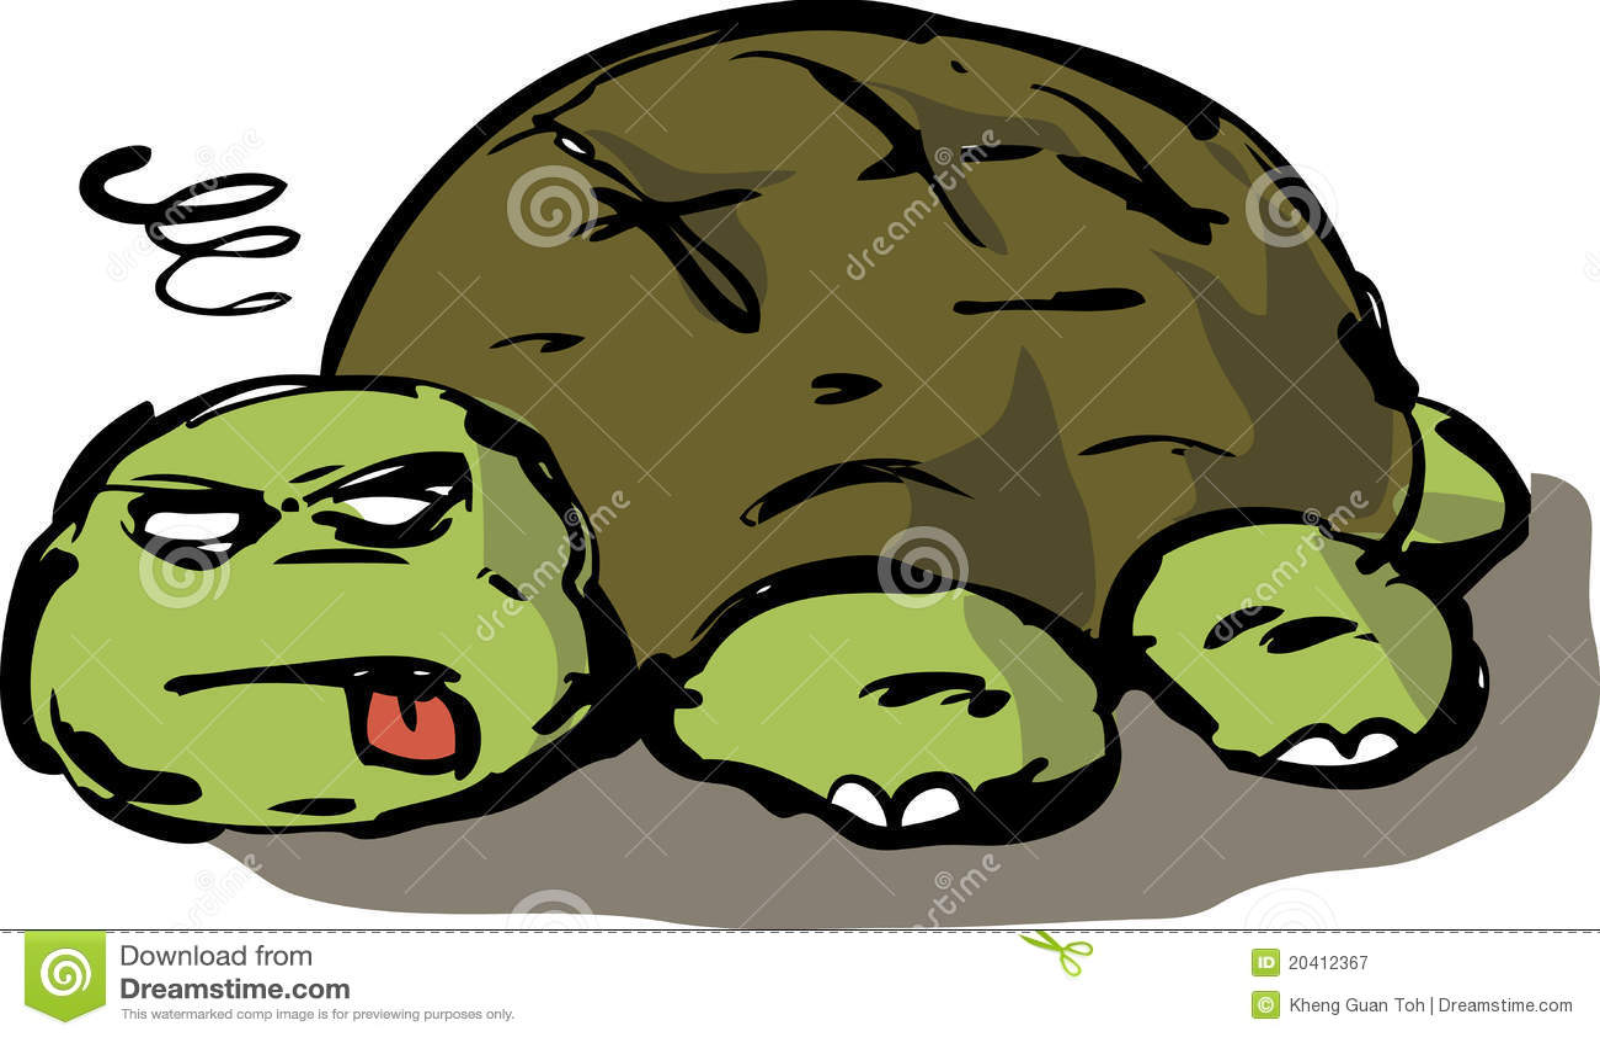 Tired Lazy Turtle Illustration Stock Illustration